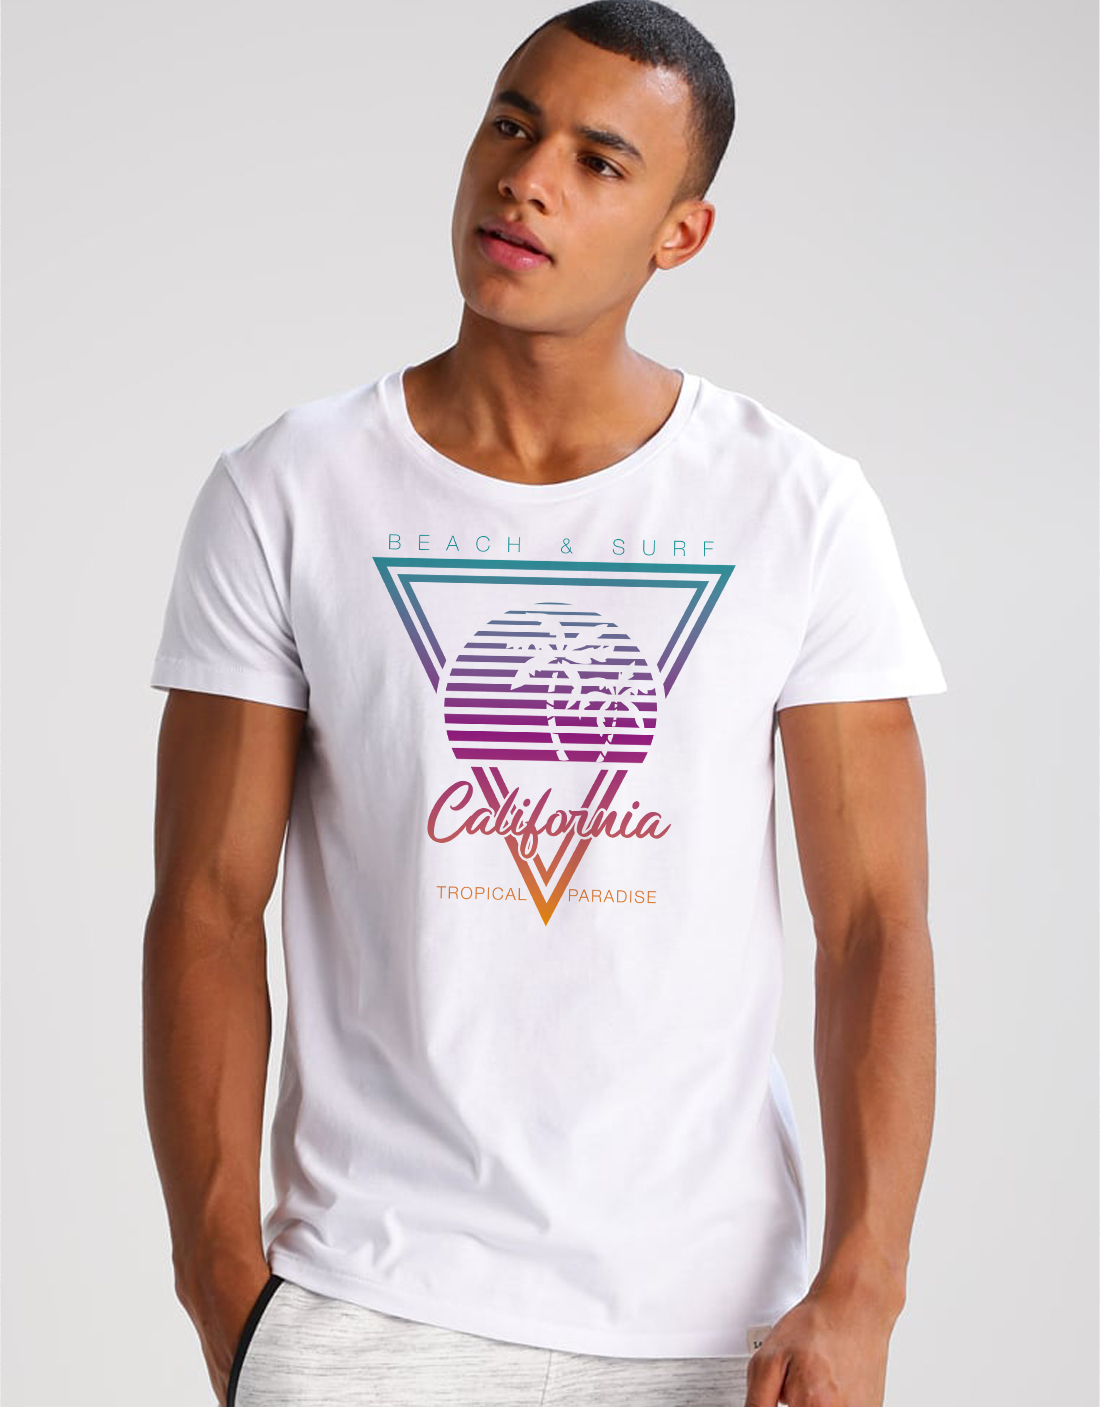 Diseño camiseta personalizada